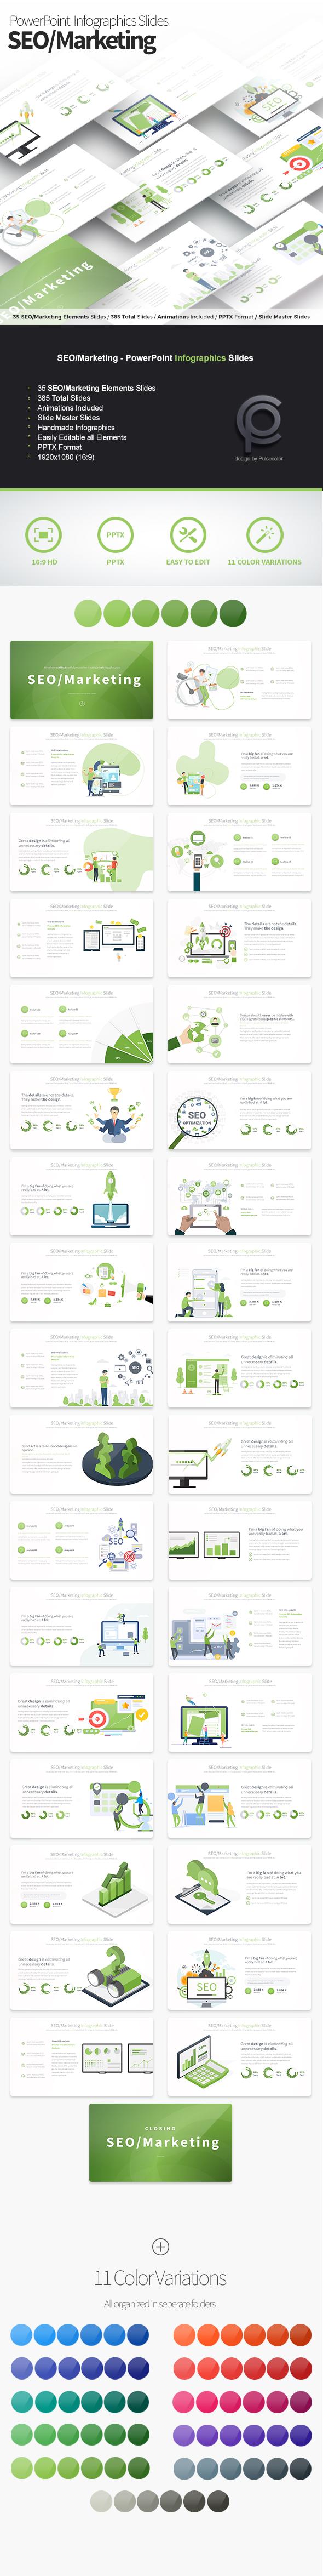 SEO/Marketing - PowerPoint Infographics Slides